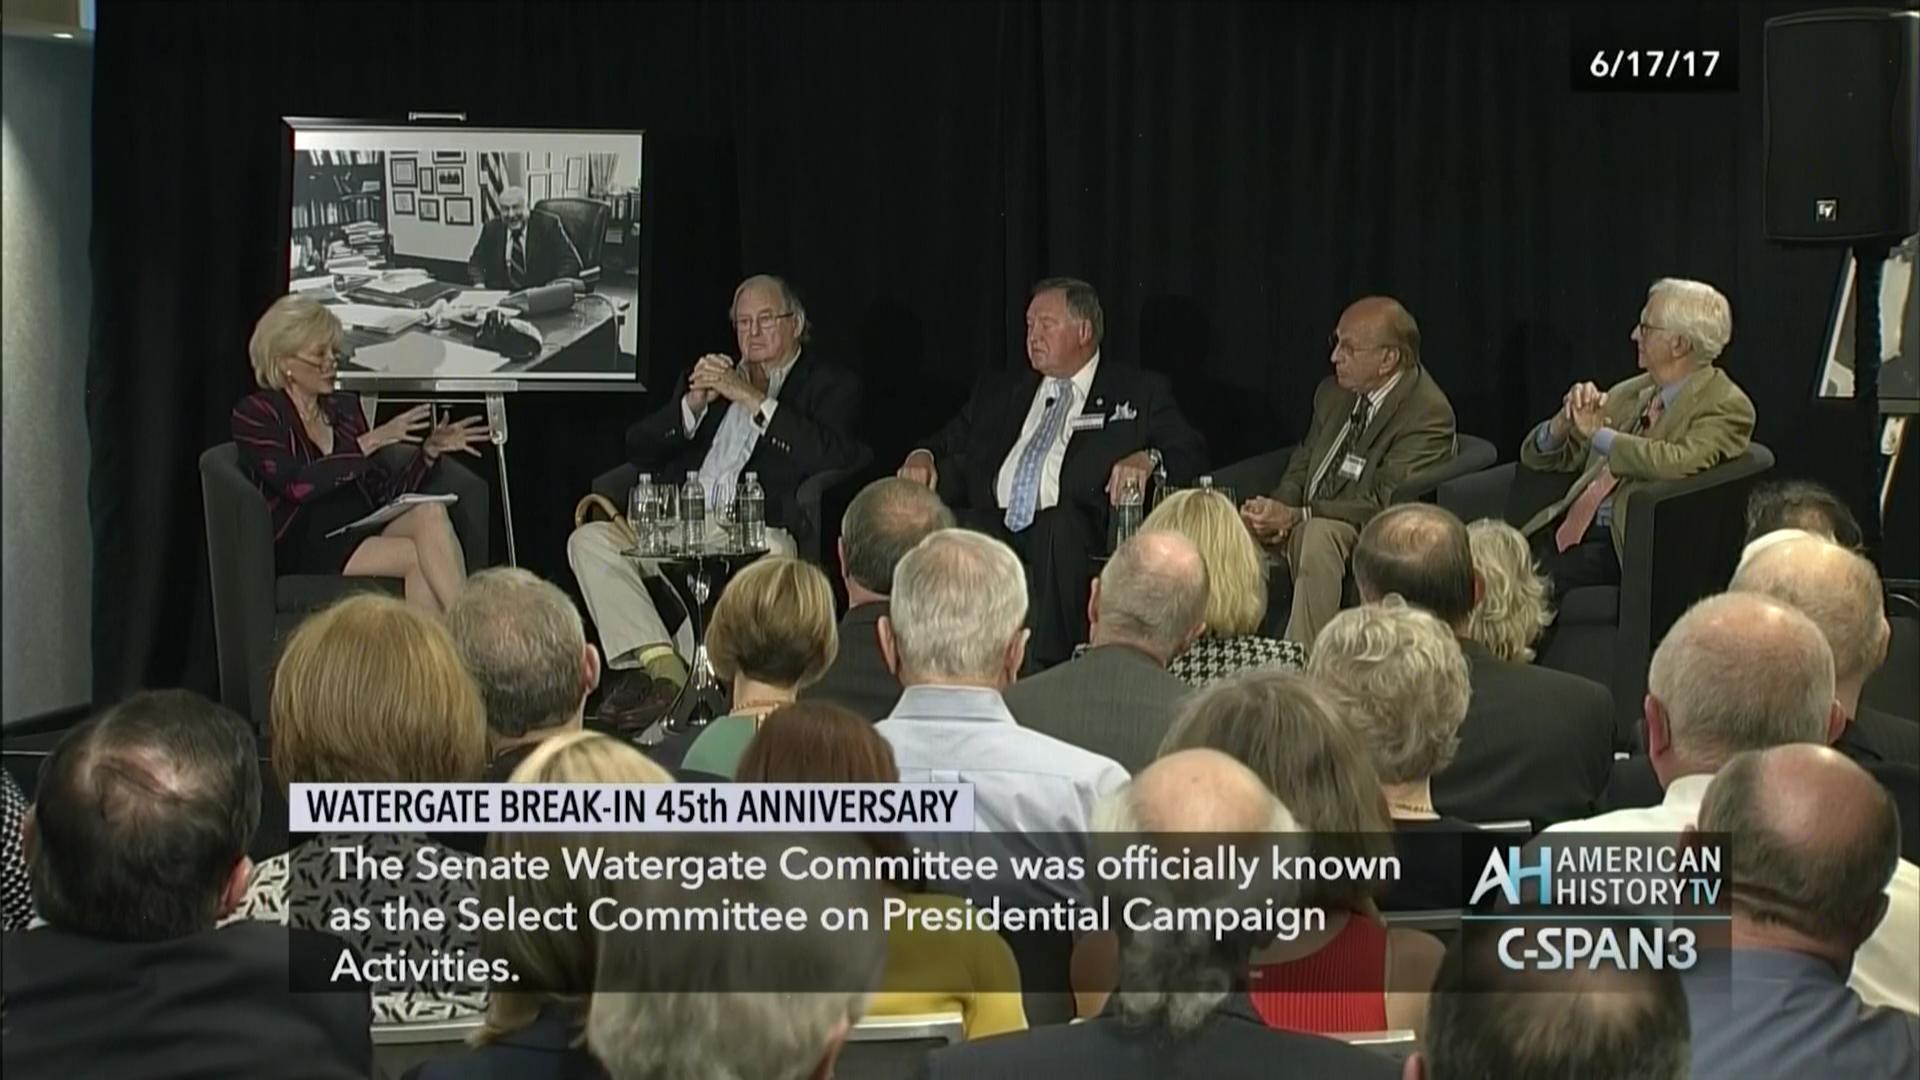 Watergate Break-In 45th Anniversary